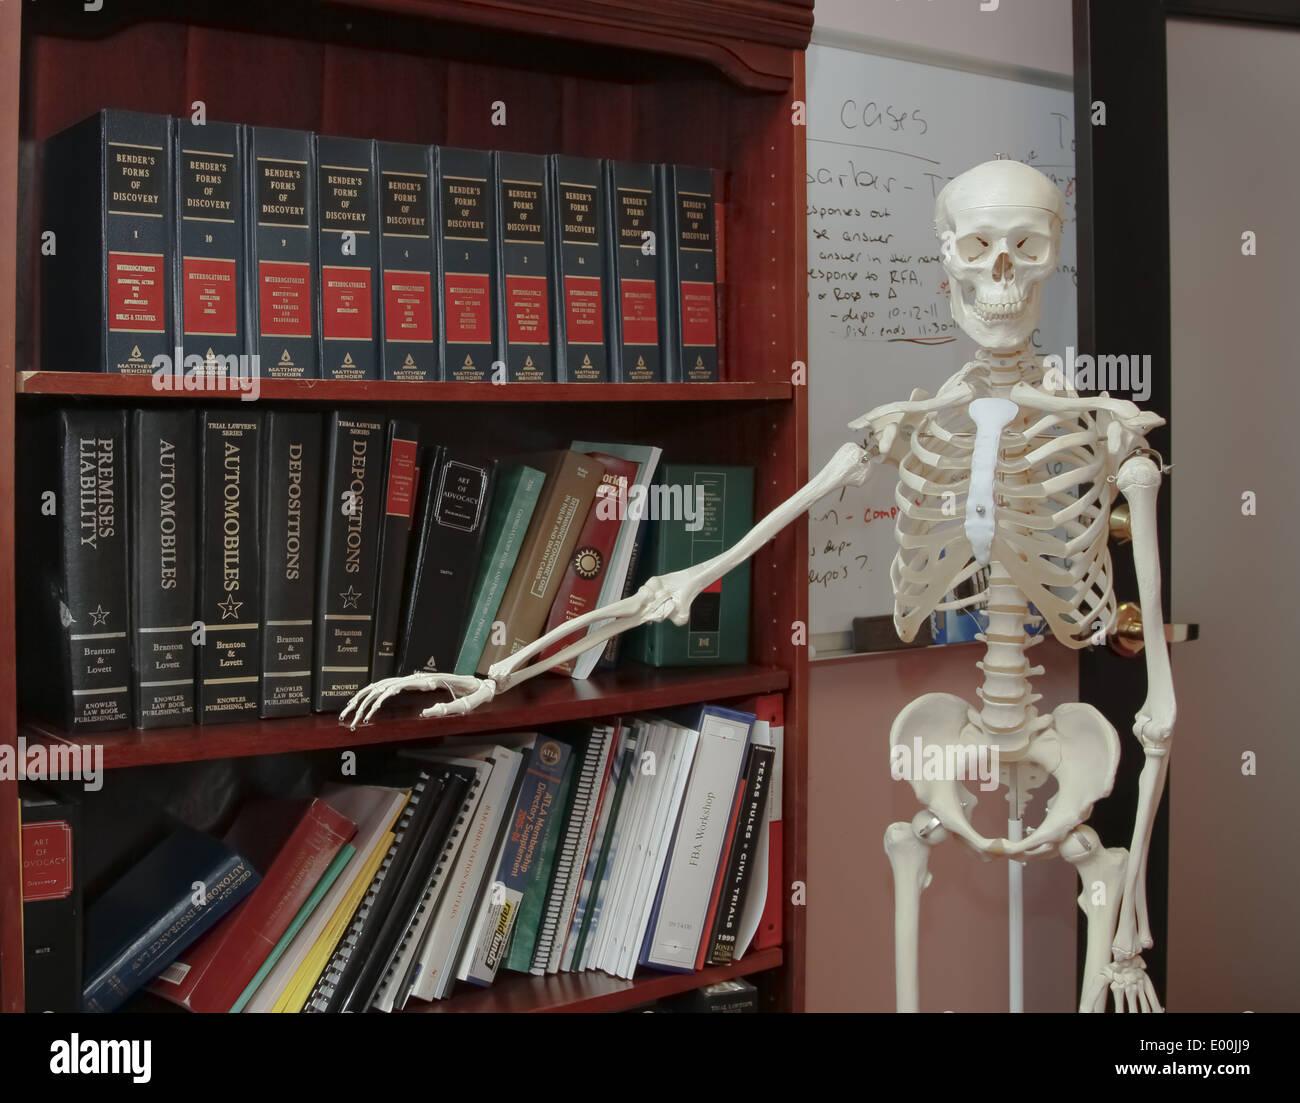 Skeleton model in posing in front of a law office bookshelf